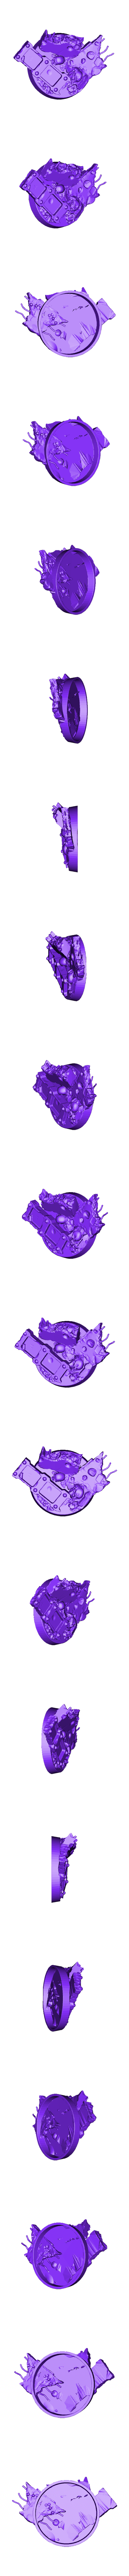 Ranger_4.1_-_Base.stl Download free STL file Martian Mechanized Rangers • 3D printable object, ErikTheHeretek